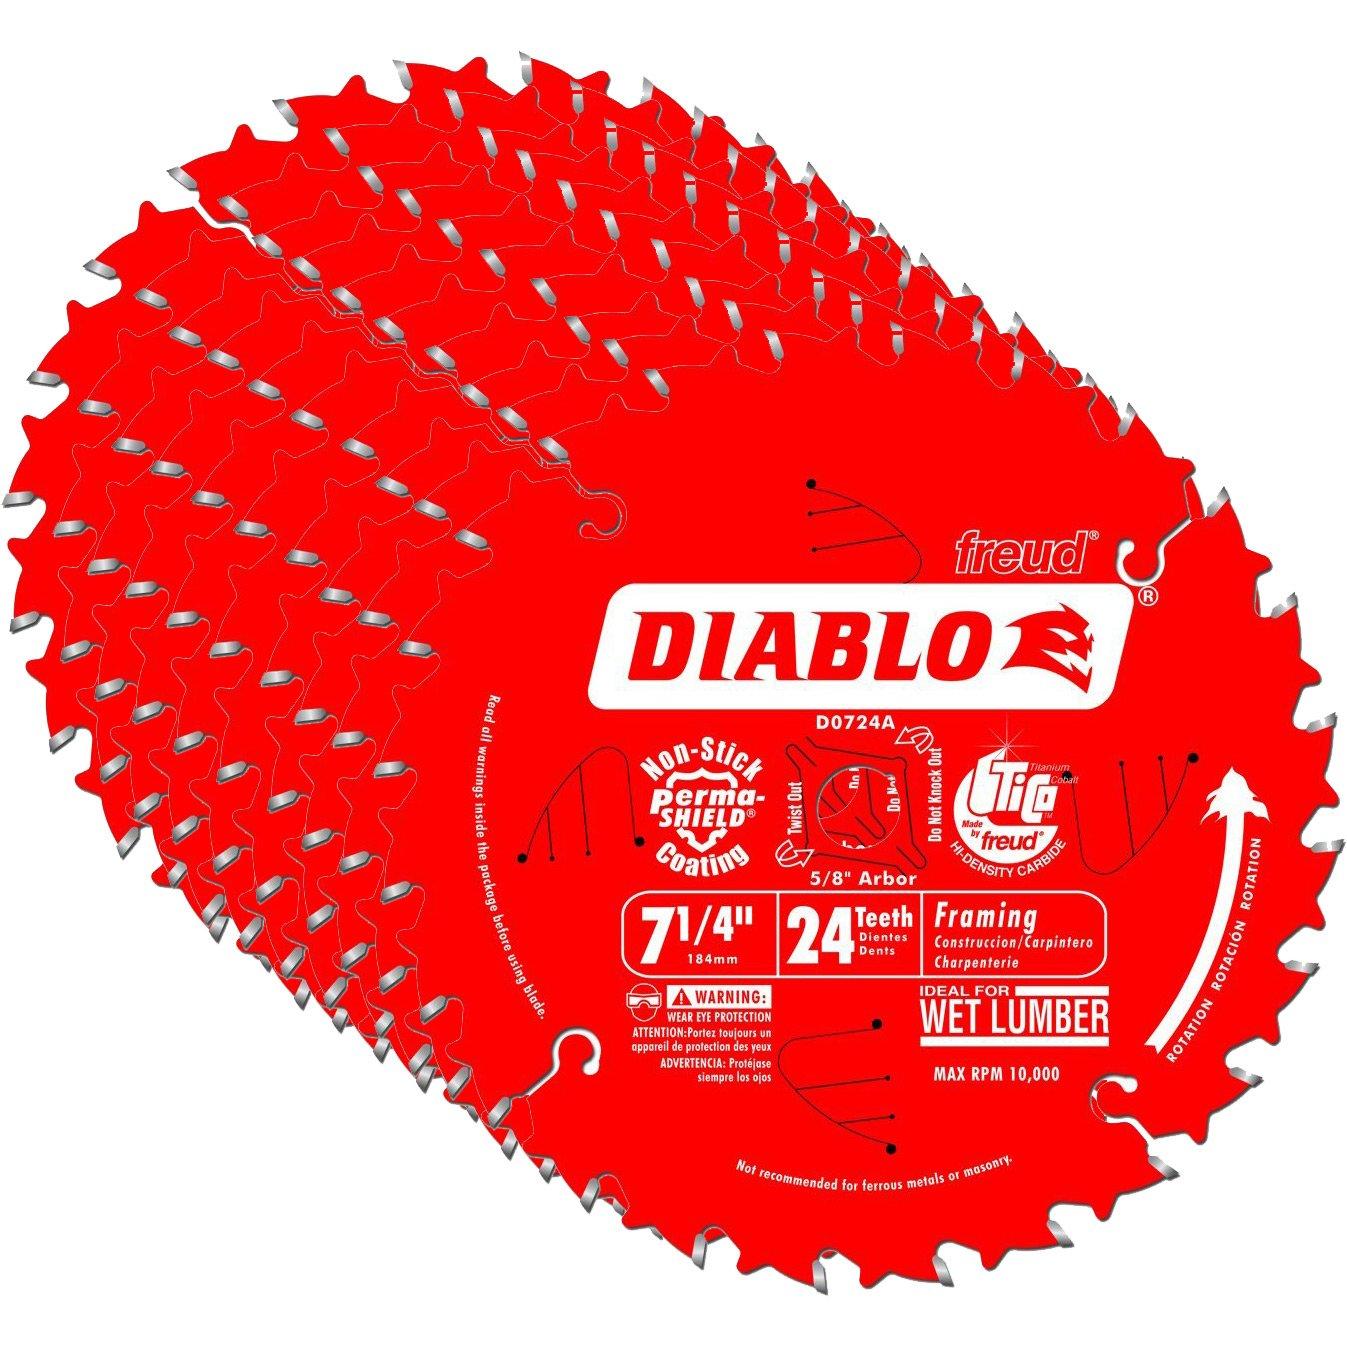 Hoja Sierra Diablo por Freud D0724A Ø184mm - 24 Dientes - eje 16mm para Madera [10un]